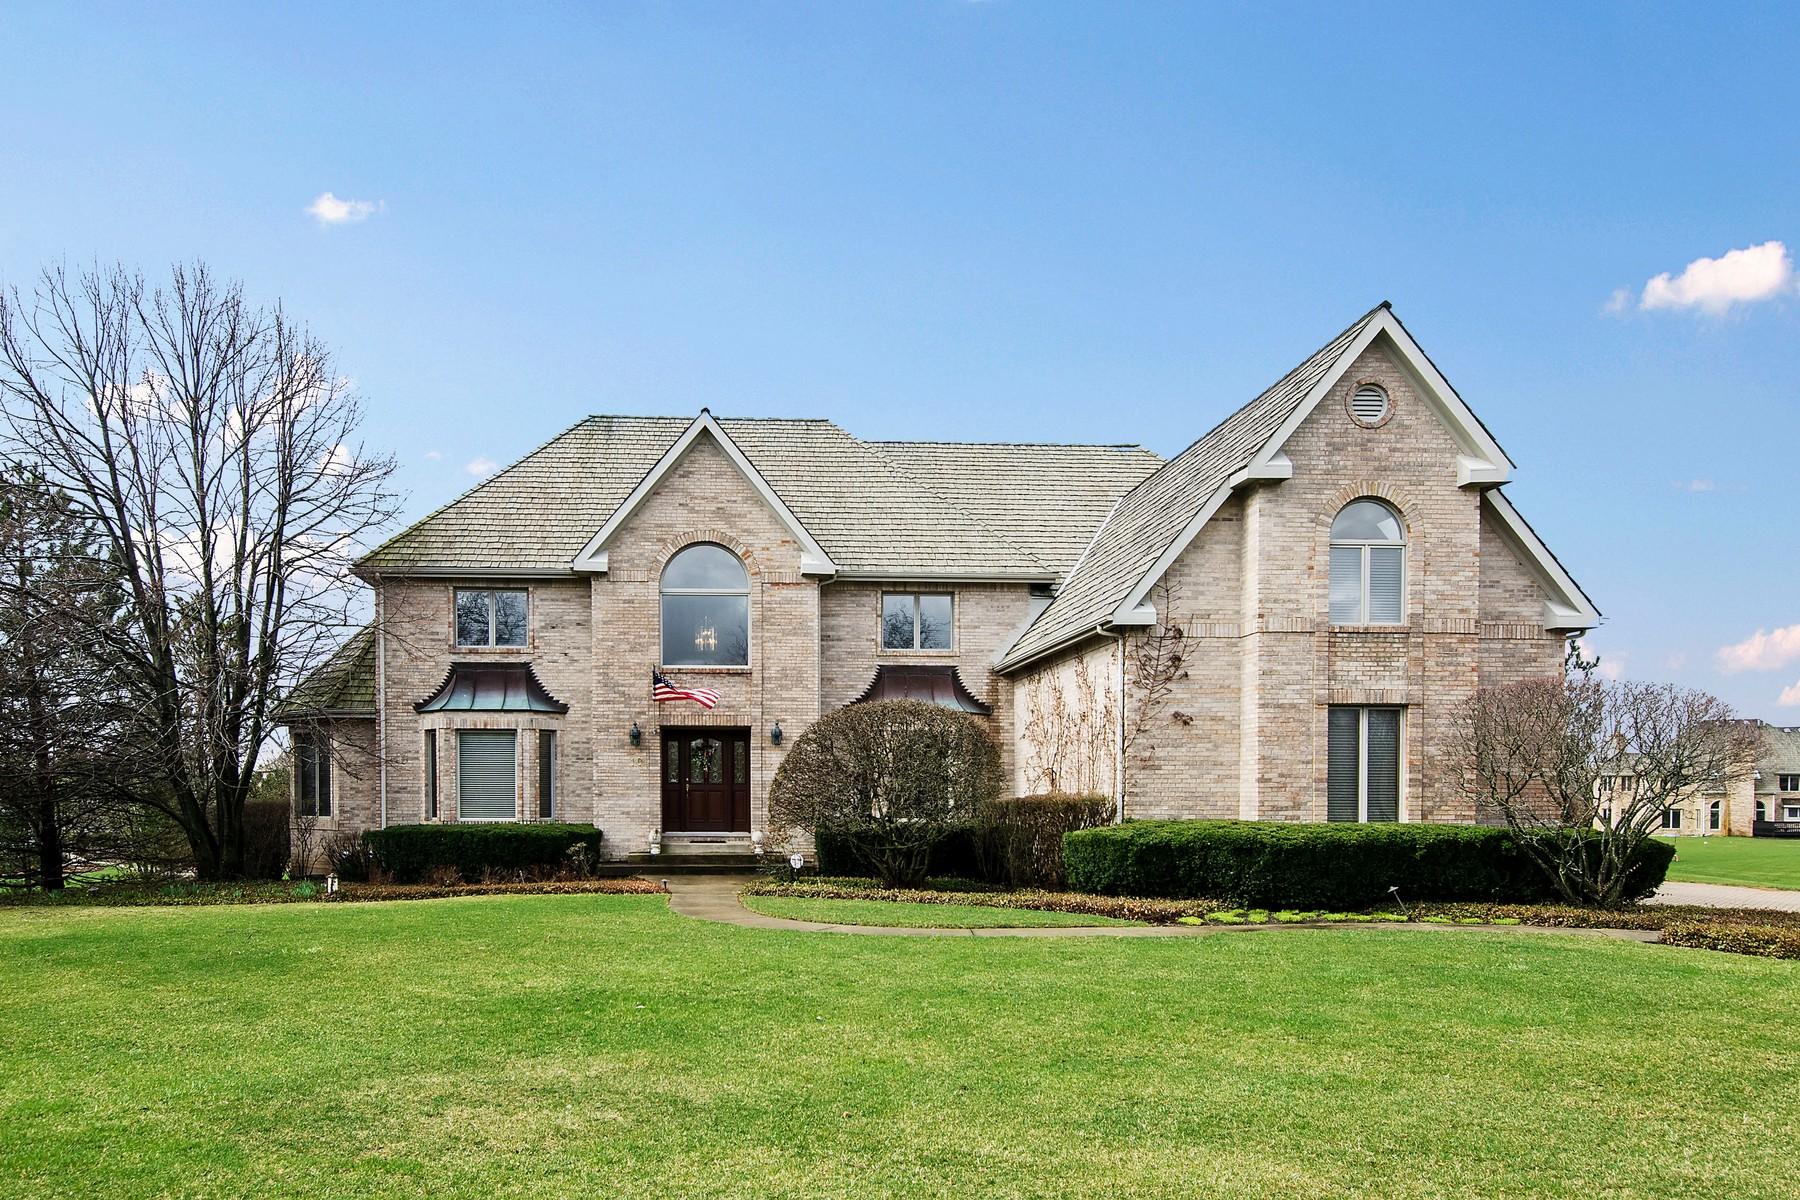 Moradia para Venda às Beautiful Two Story Home 10 Pembury Way South Barrington, Illinois, 60010 Estados Unidos